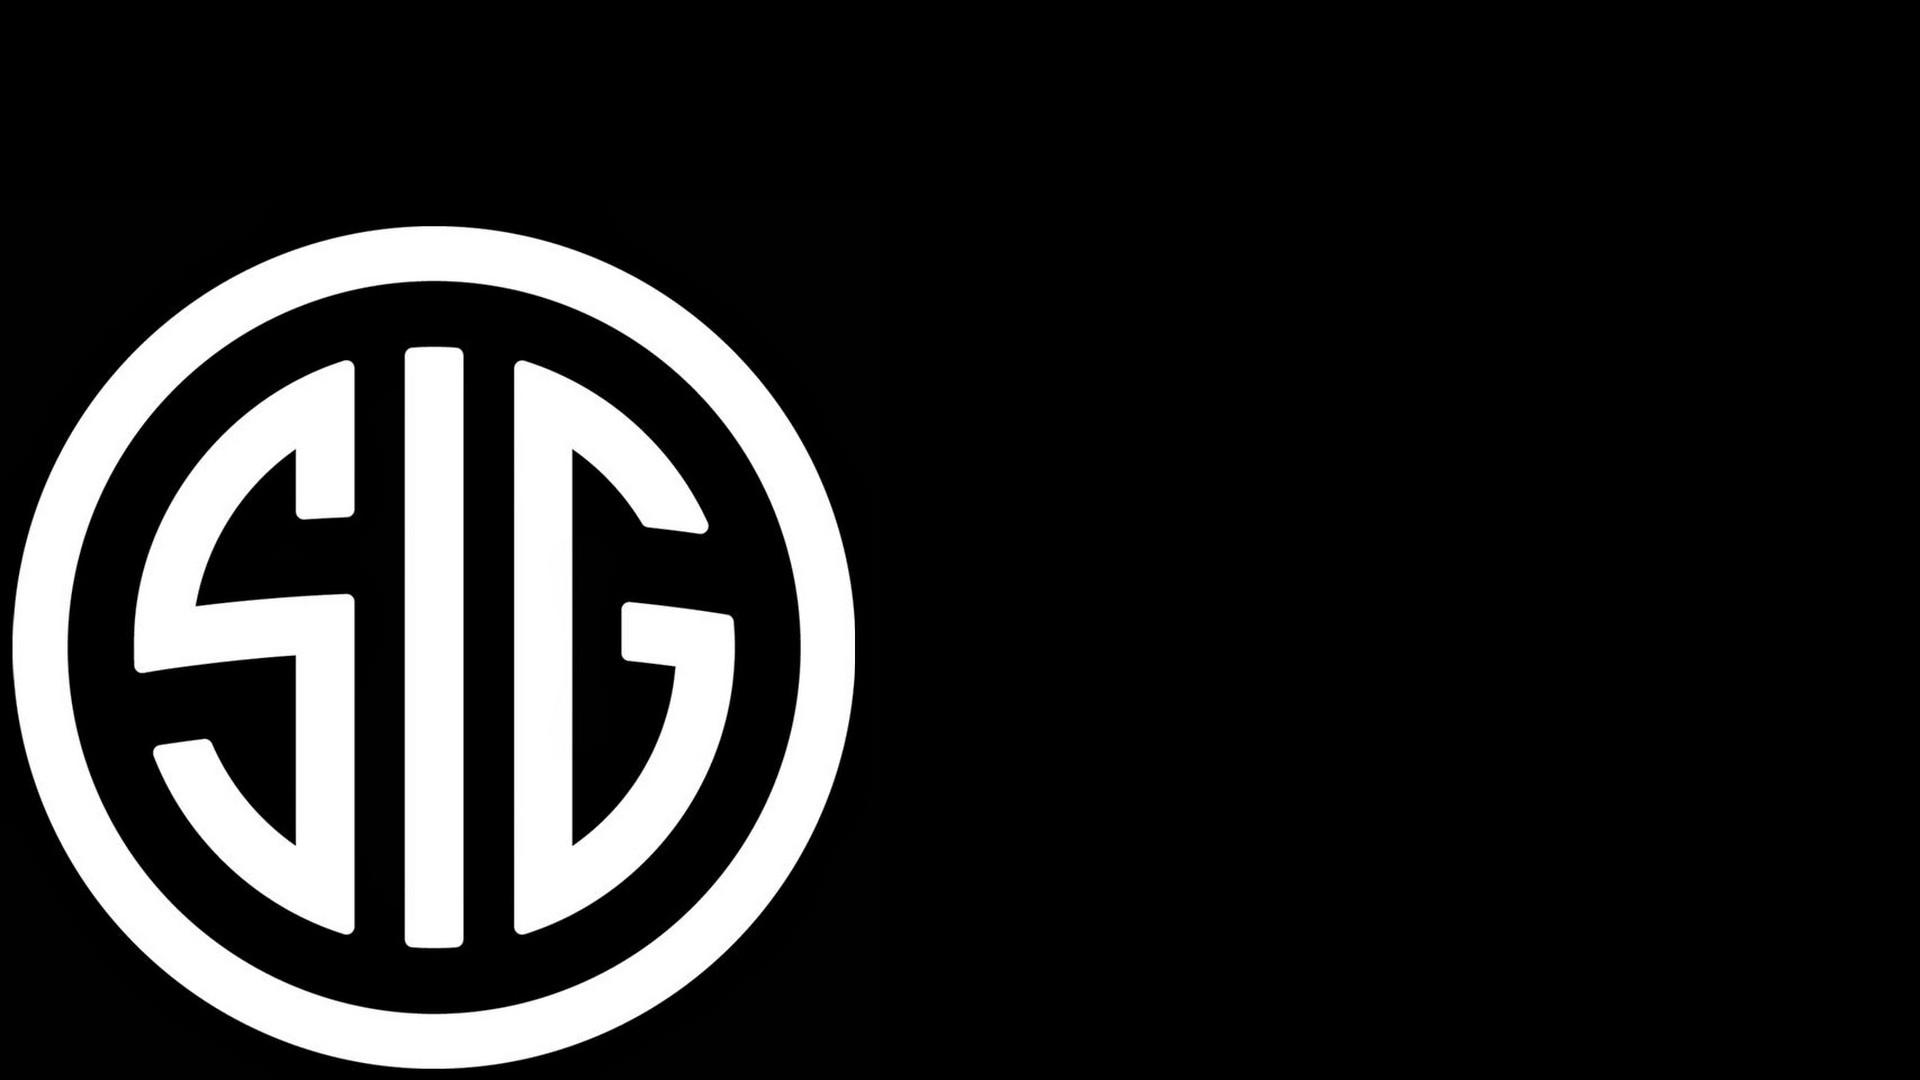 sig sauer logo wallpaper (69+ images)